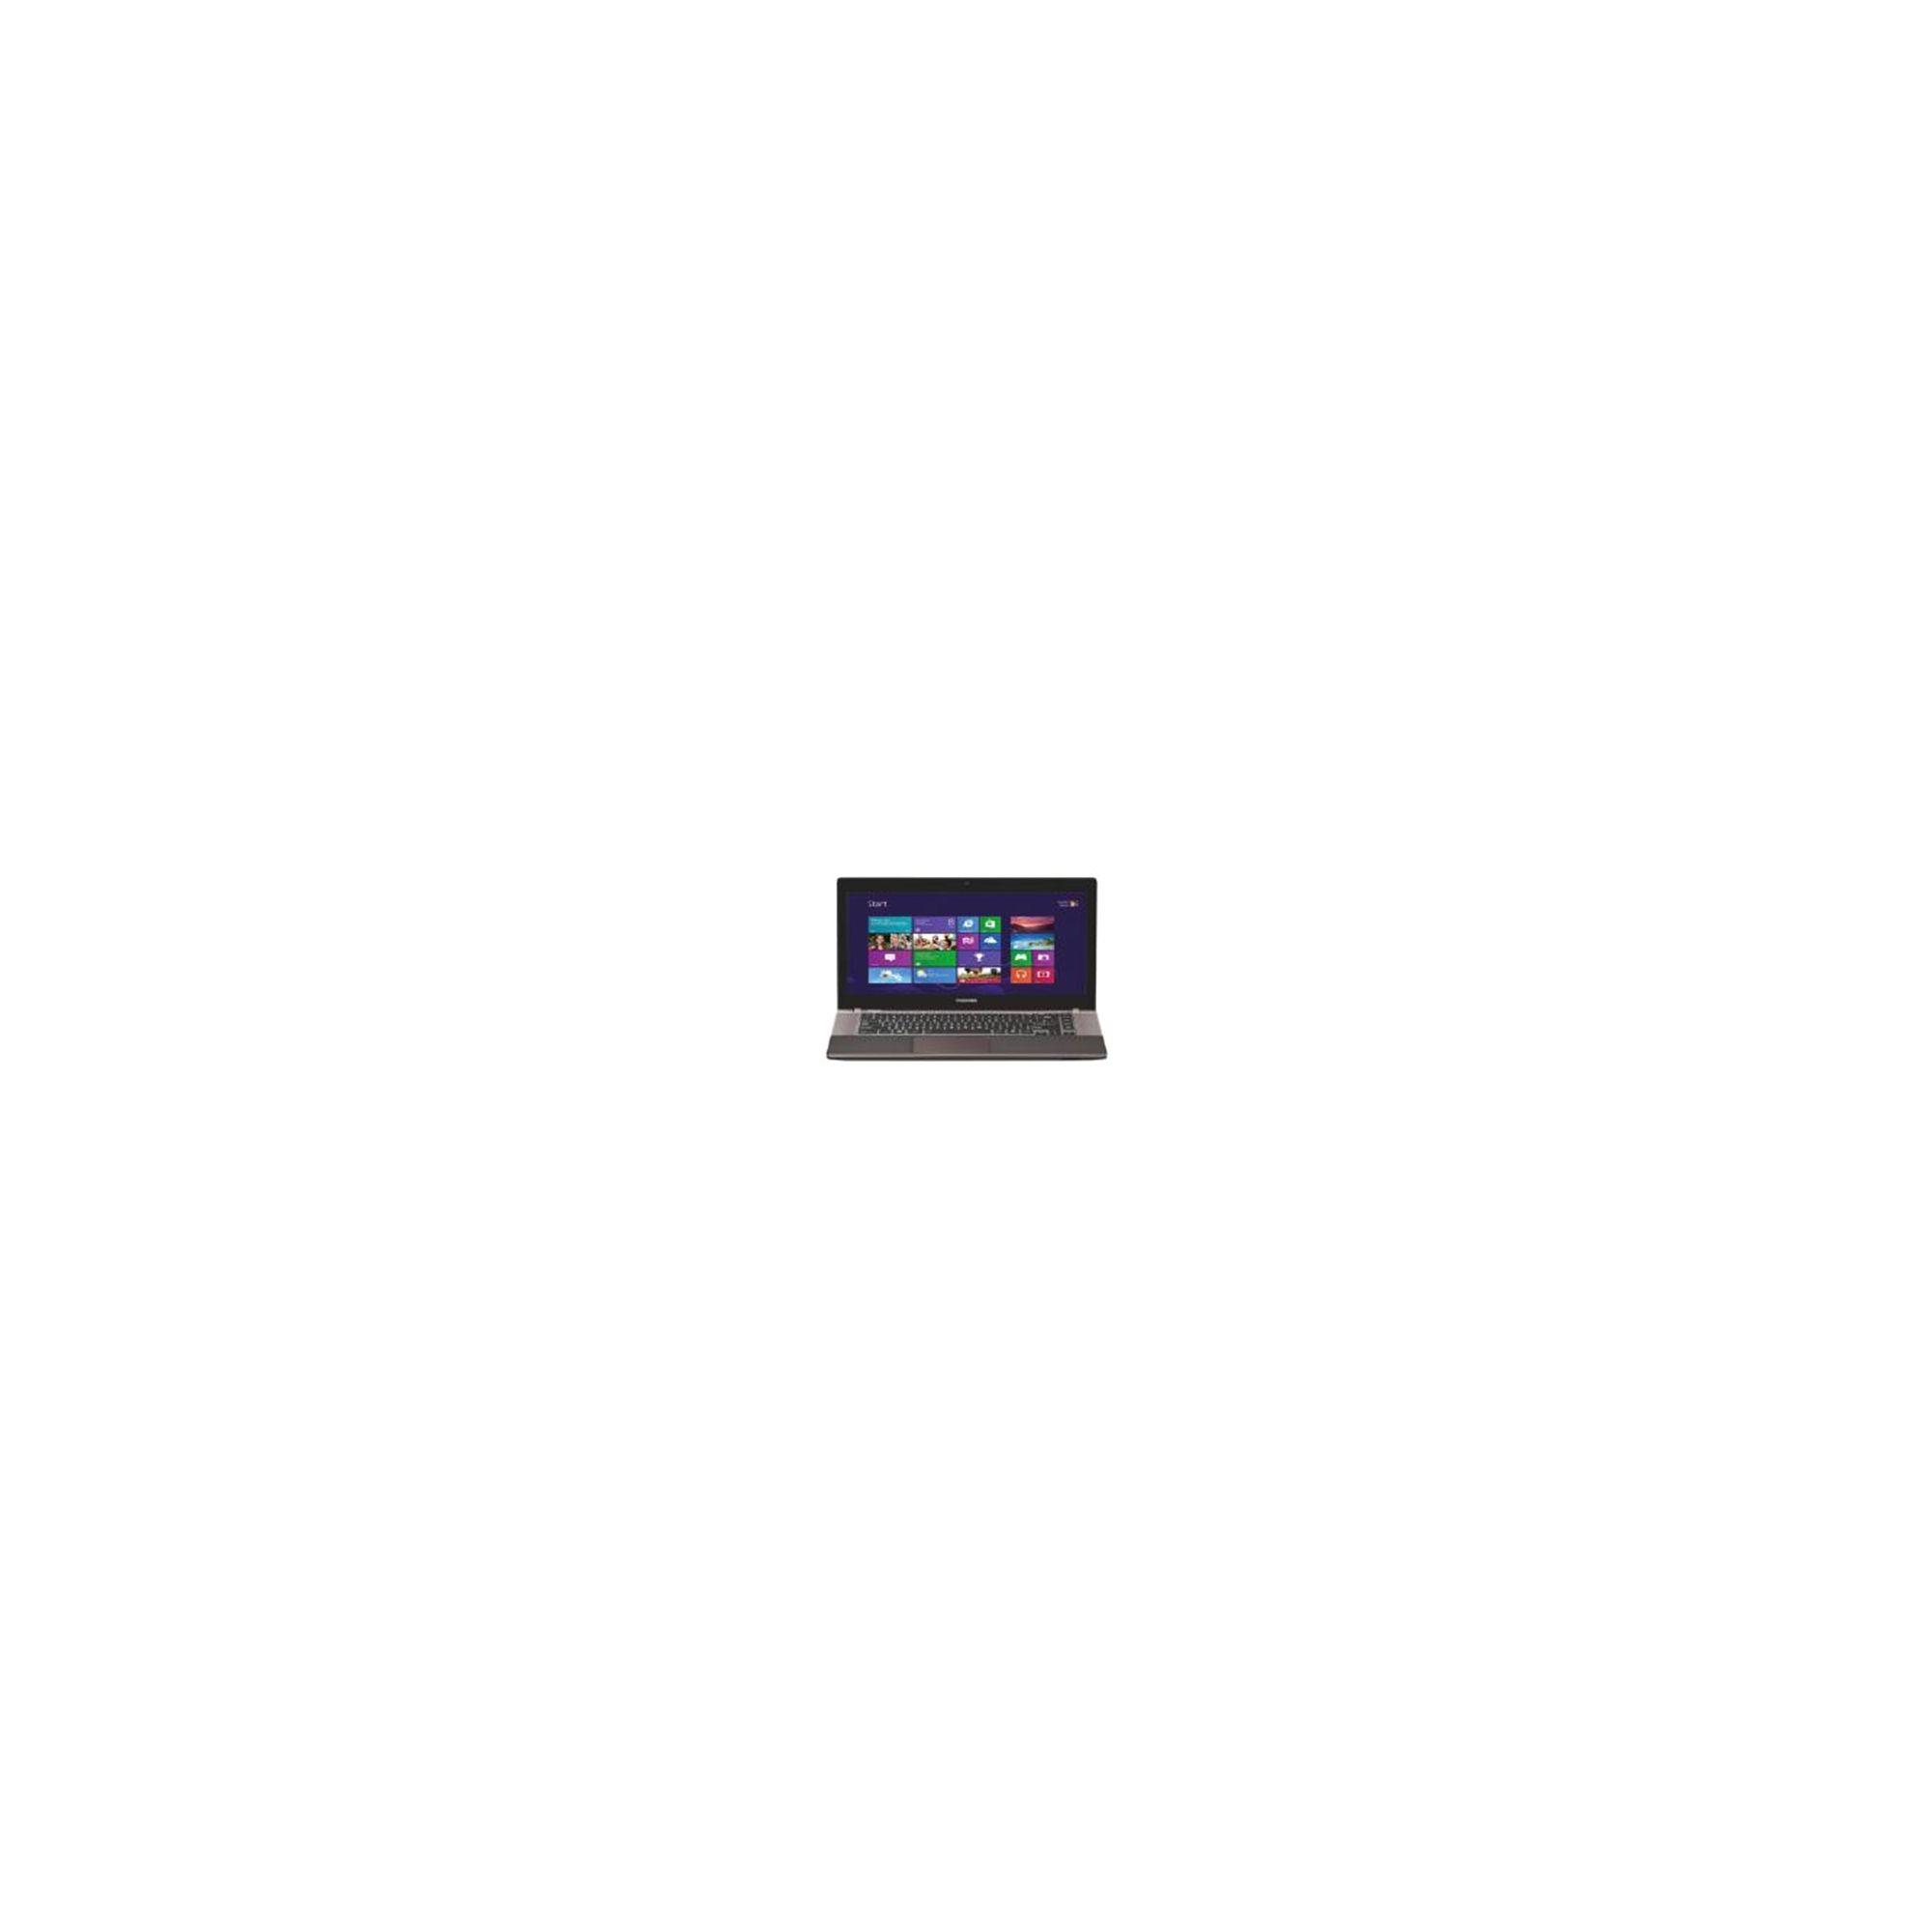 Toshiba Satellite U840W-10J (14.4 inch) Notebook Core i5 (3317U) 2.6GHz 6GB (1x4GB+1x2GB) 500GB 32GB (SSD) WLAN BT Webcam Windows 8 64-bit (Intel HD at Tesco Direct